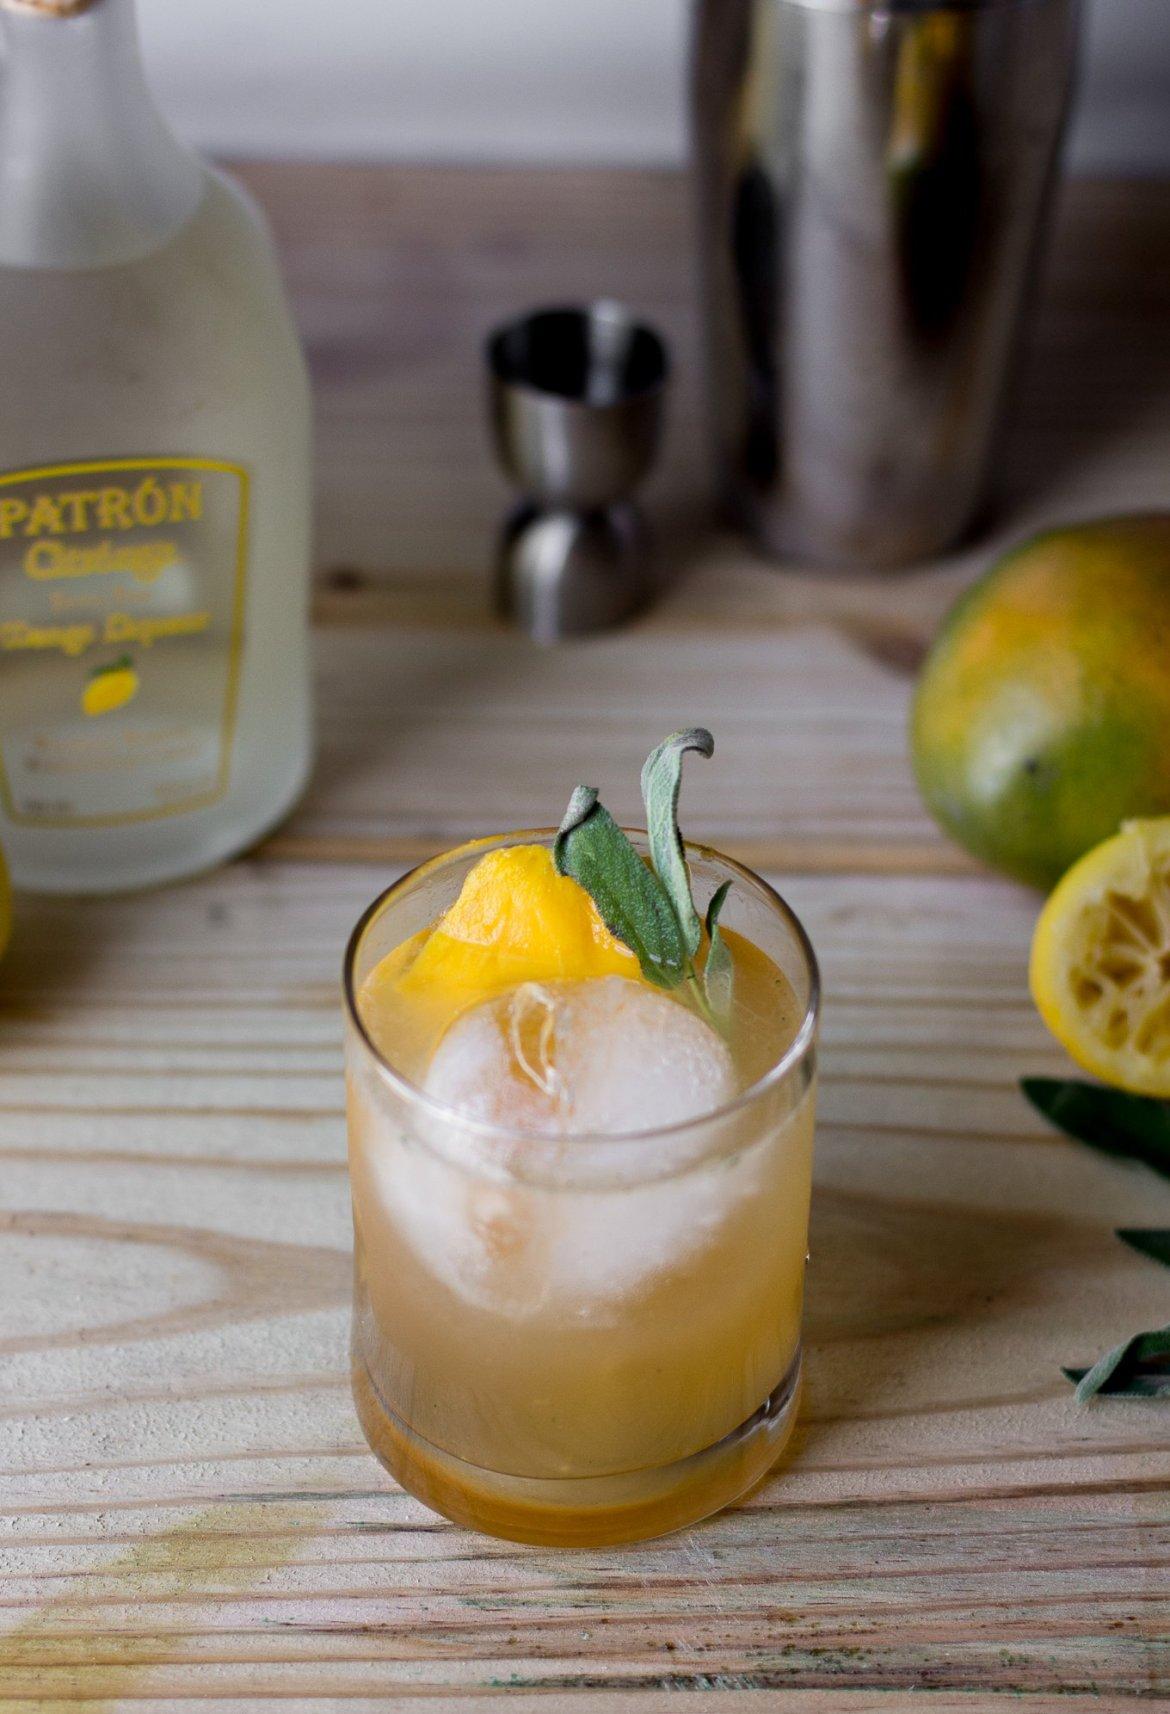 patron, patron tequila, patron margarita of the year, patron margarita, mango margarita